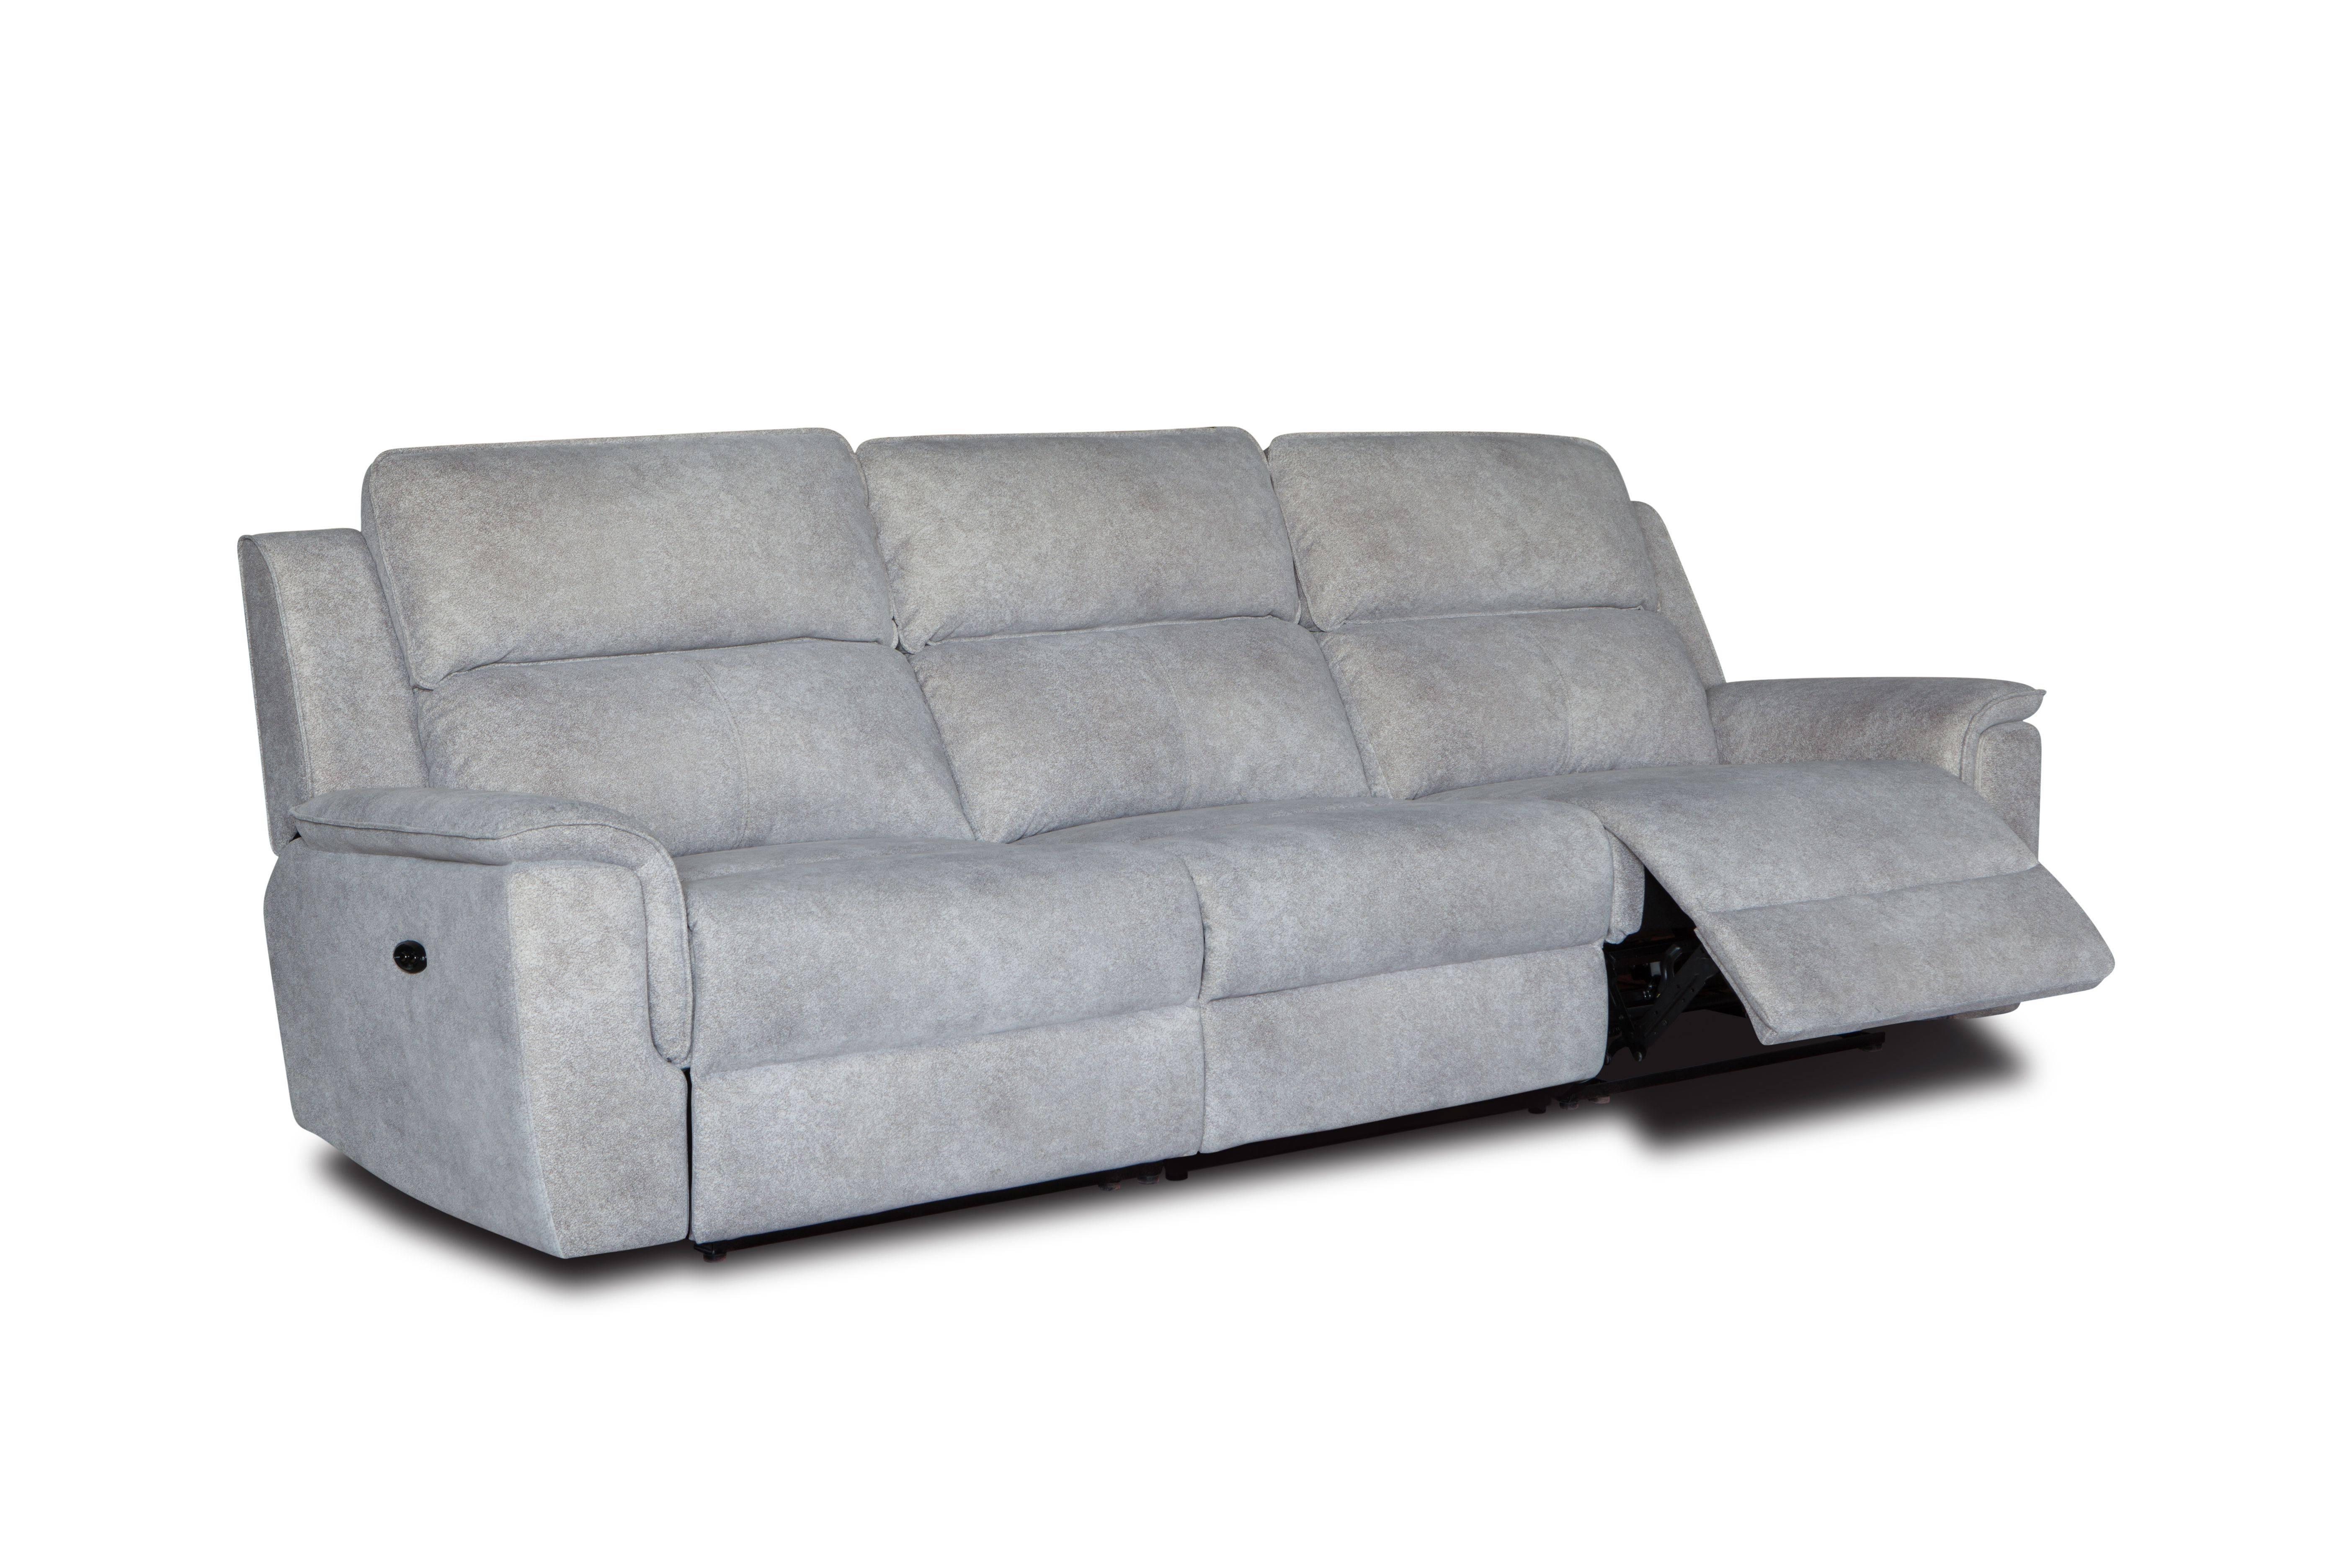 - China PriceList For Nice Dream Memory Foam Mattress - Modern